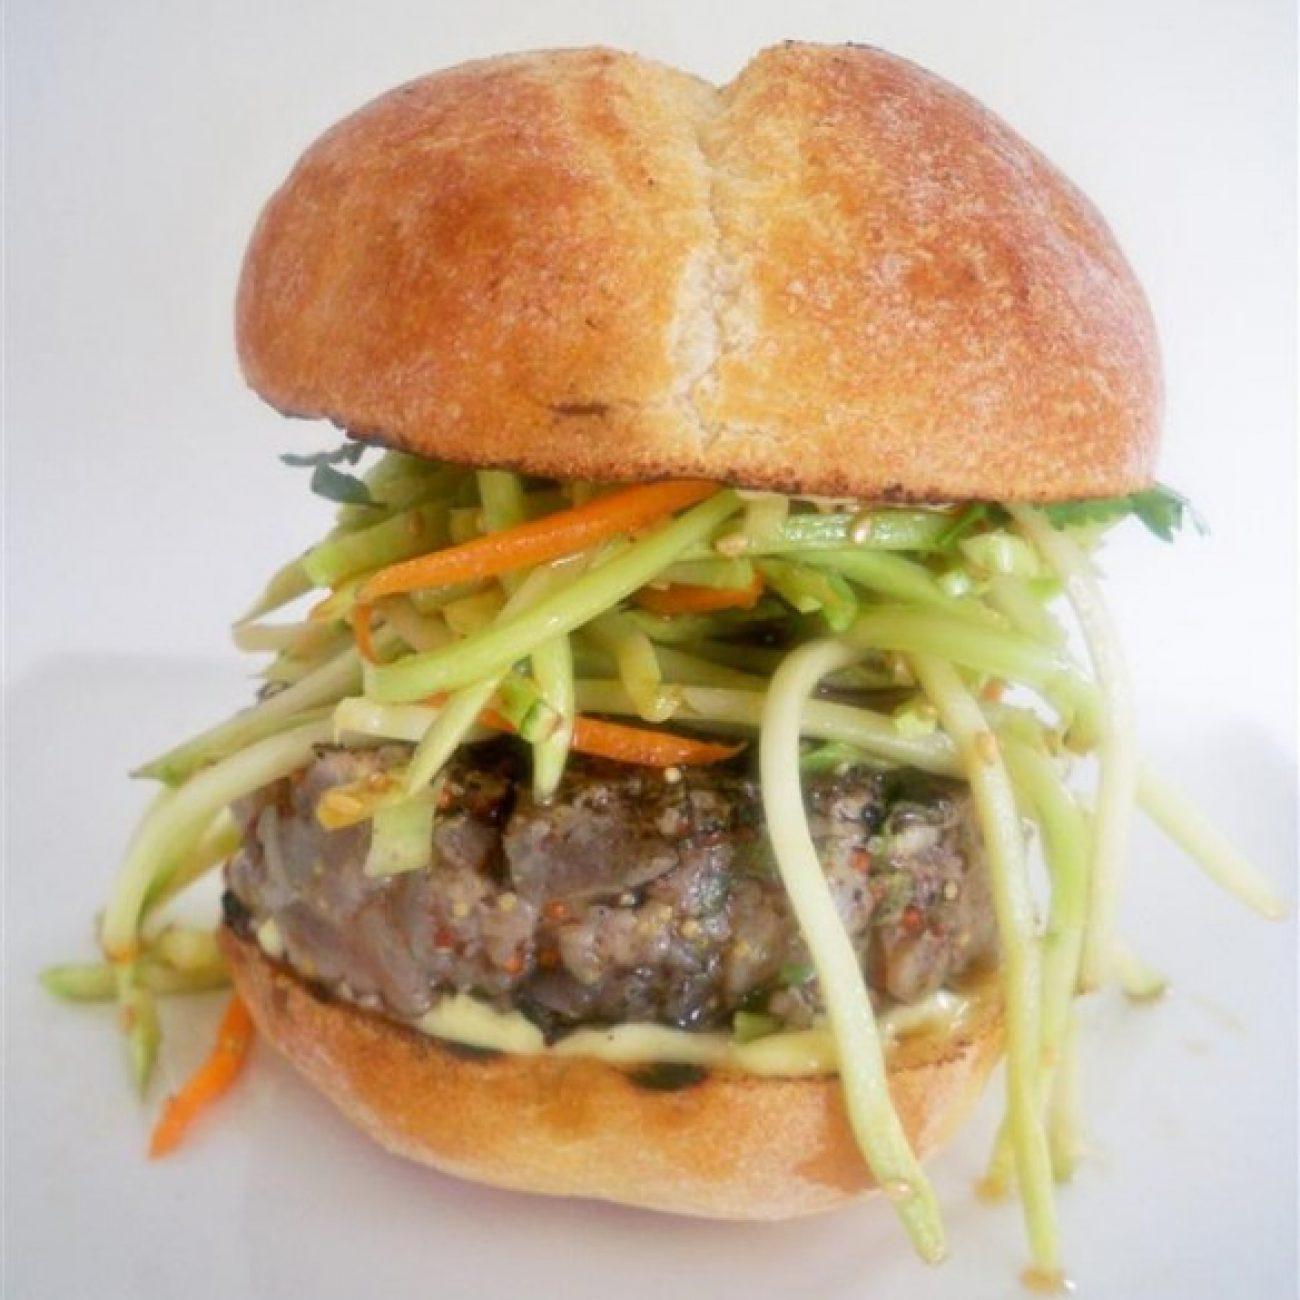 Grilled Tuna Burgers with broccoli Asian slaw